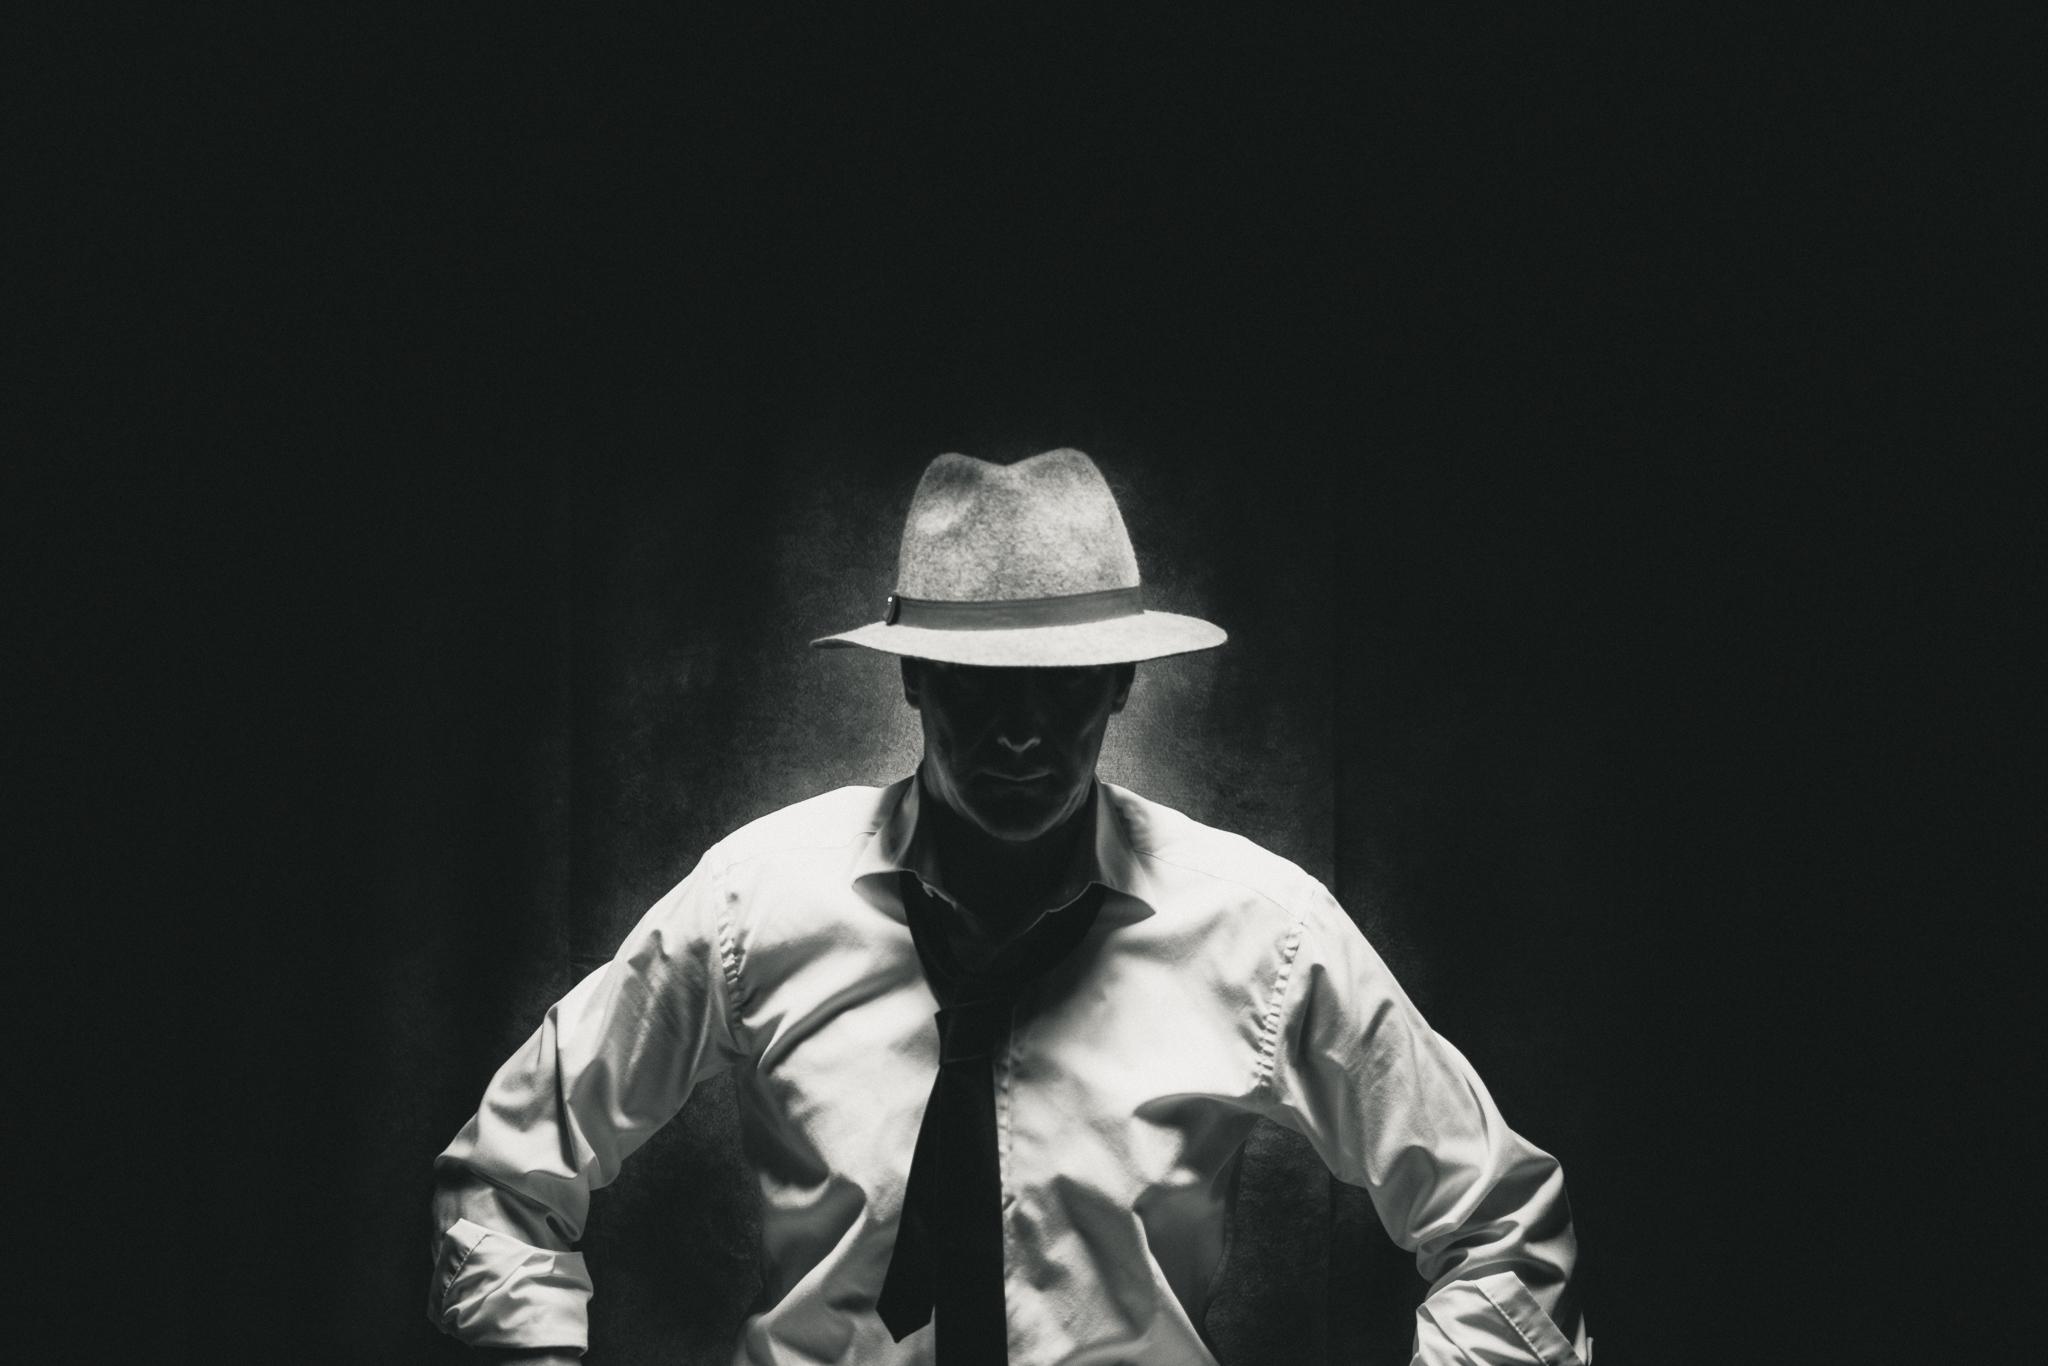 Selfie Film Noir Black and White - m-foerster.com